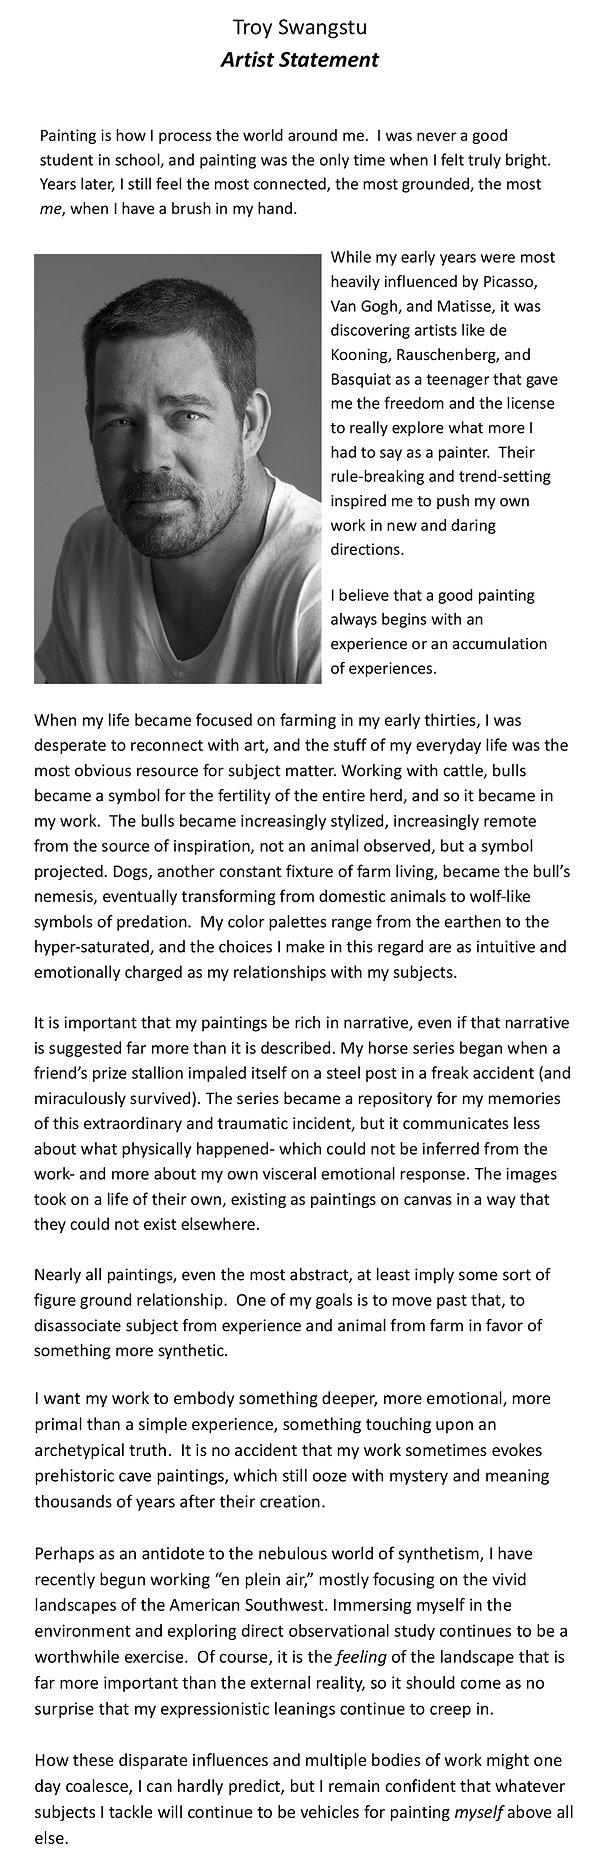 Troy Swangstu Artist Statement long statement.jpg